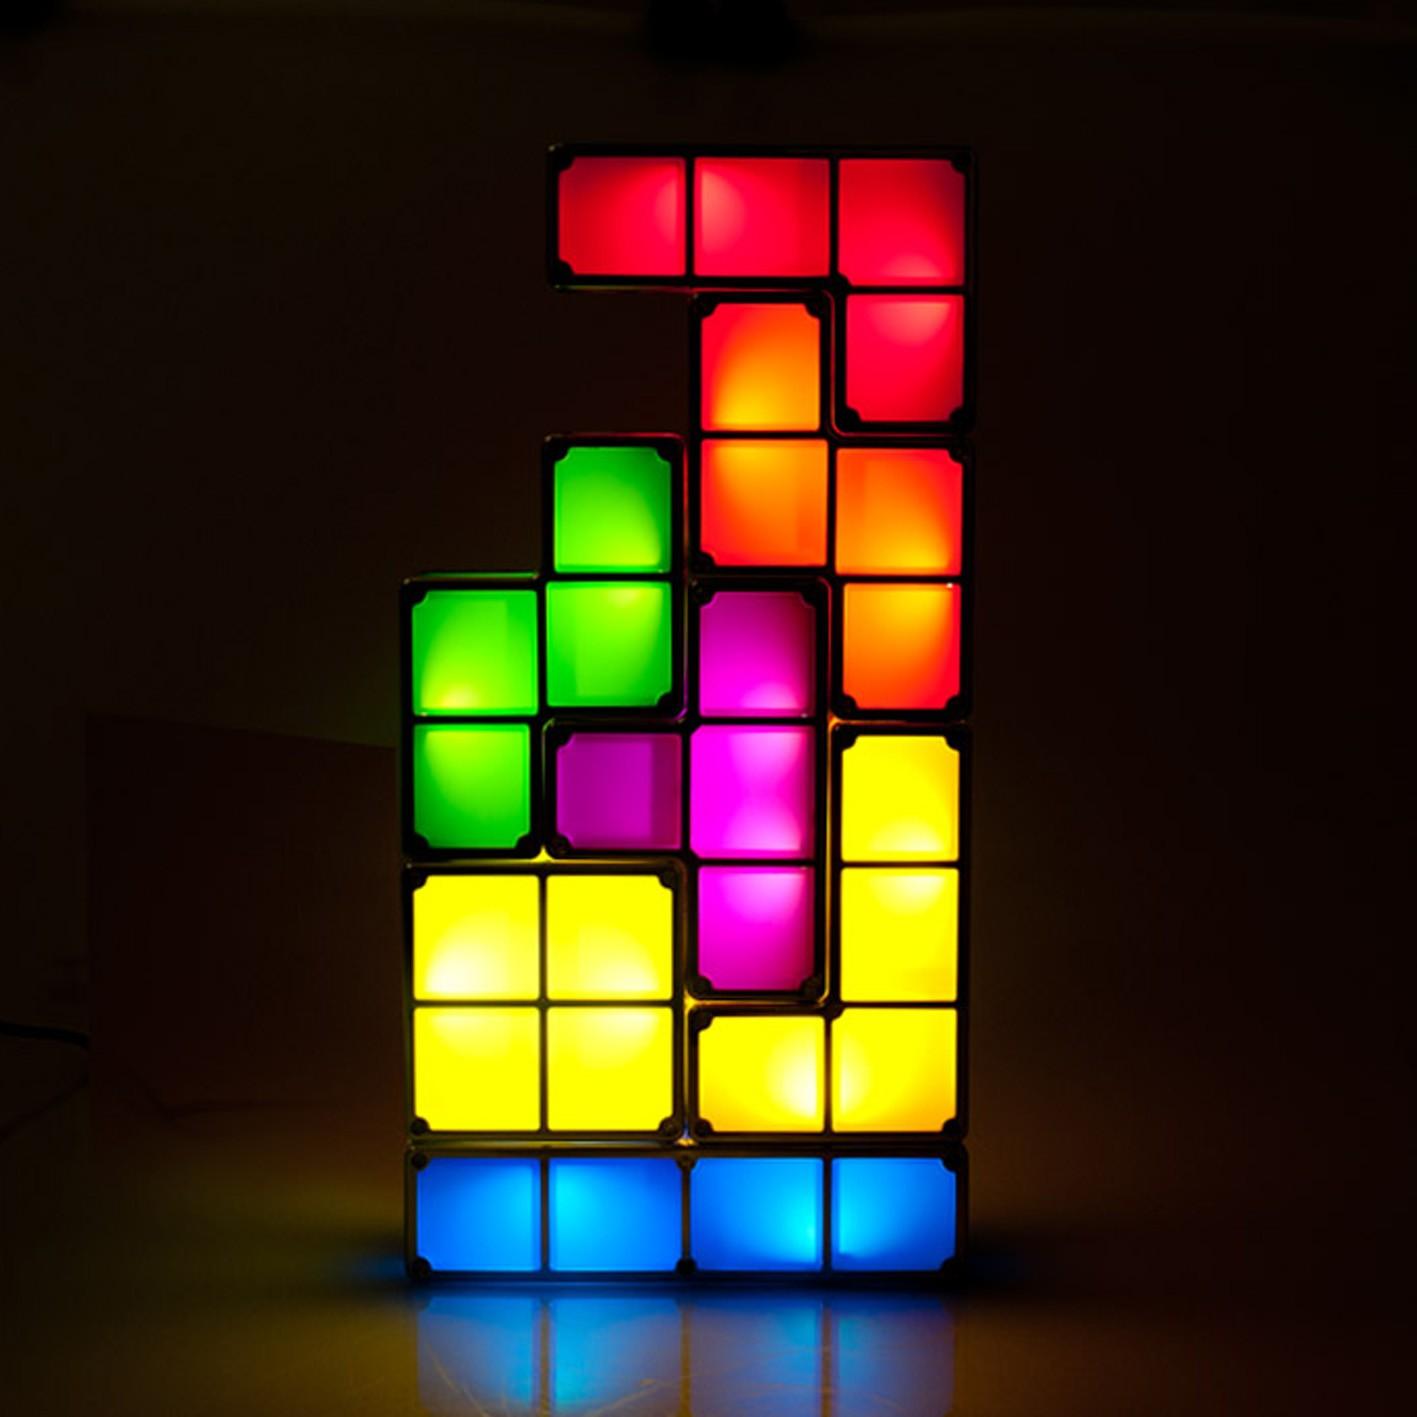 lampe tetris design cadeau geek insolite super insolite. Black Bedroom Furniture Sets. Home Design Ideas